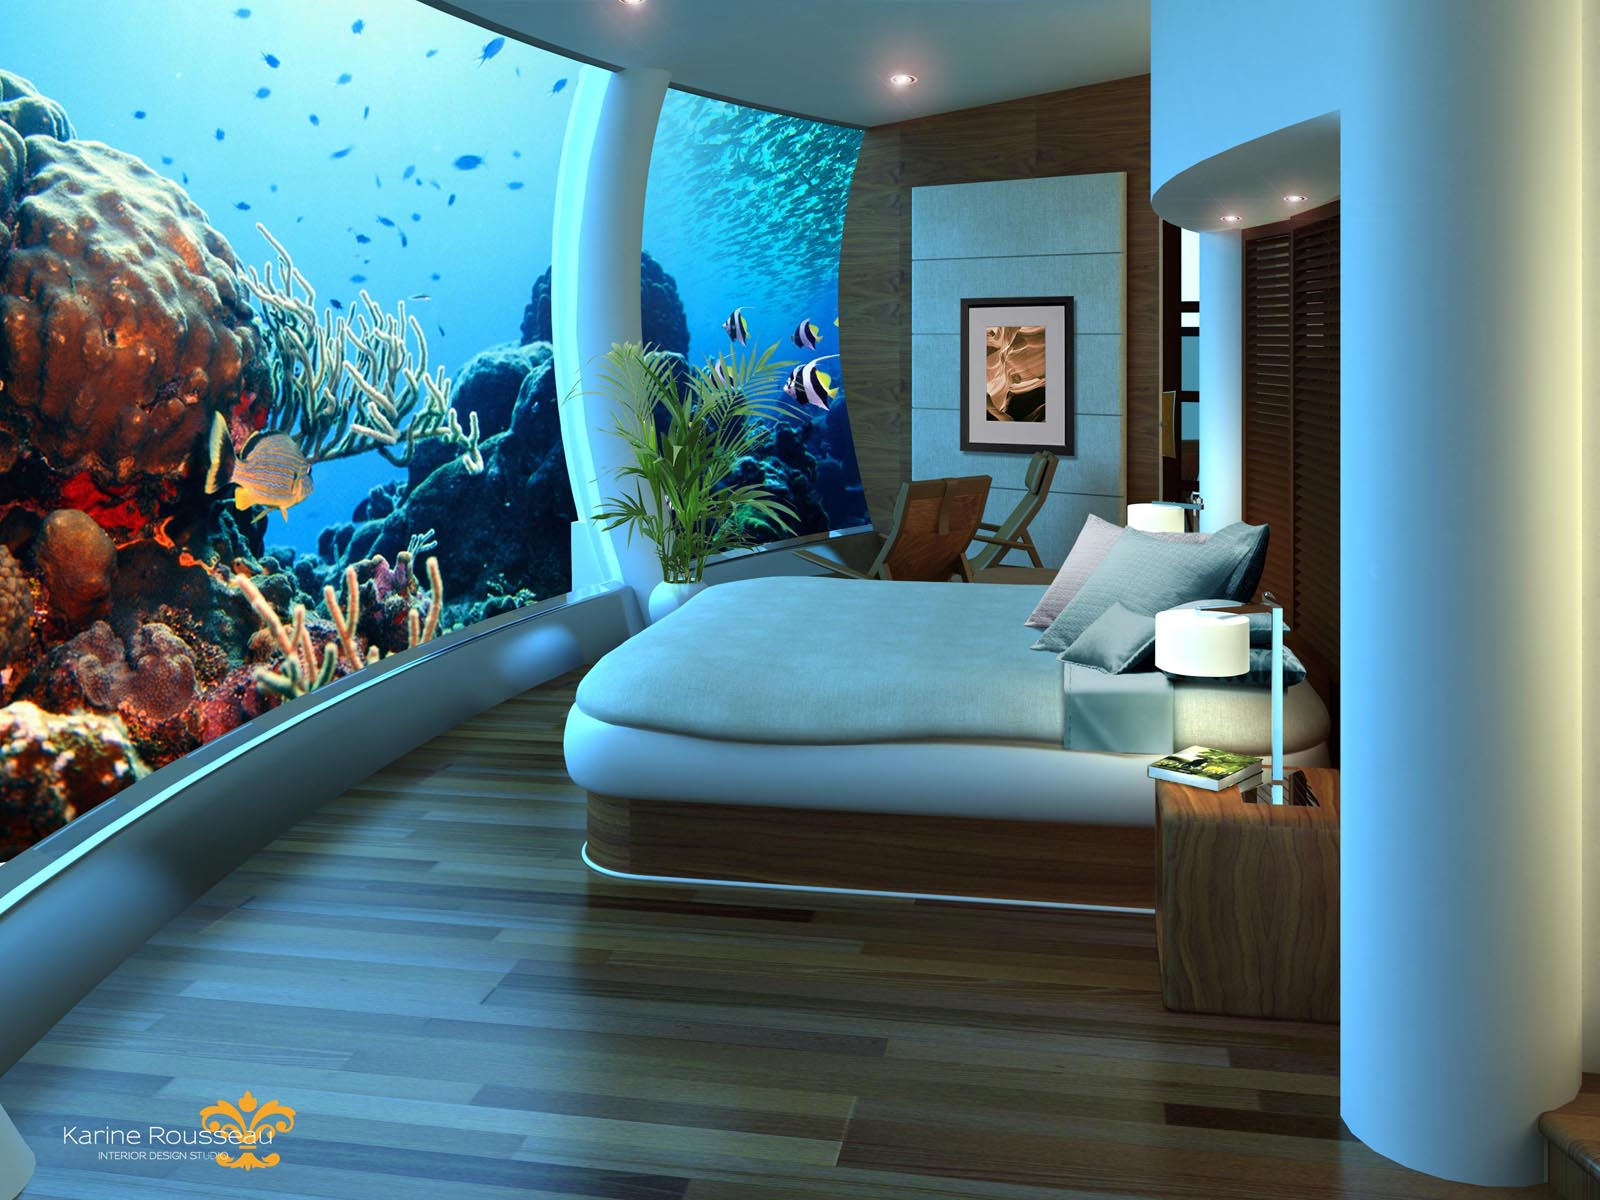 The Underwater Hotel - Poseidon Resort Fiji Islands